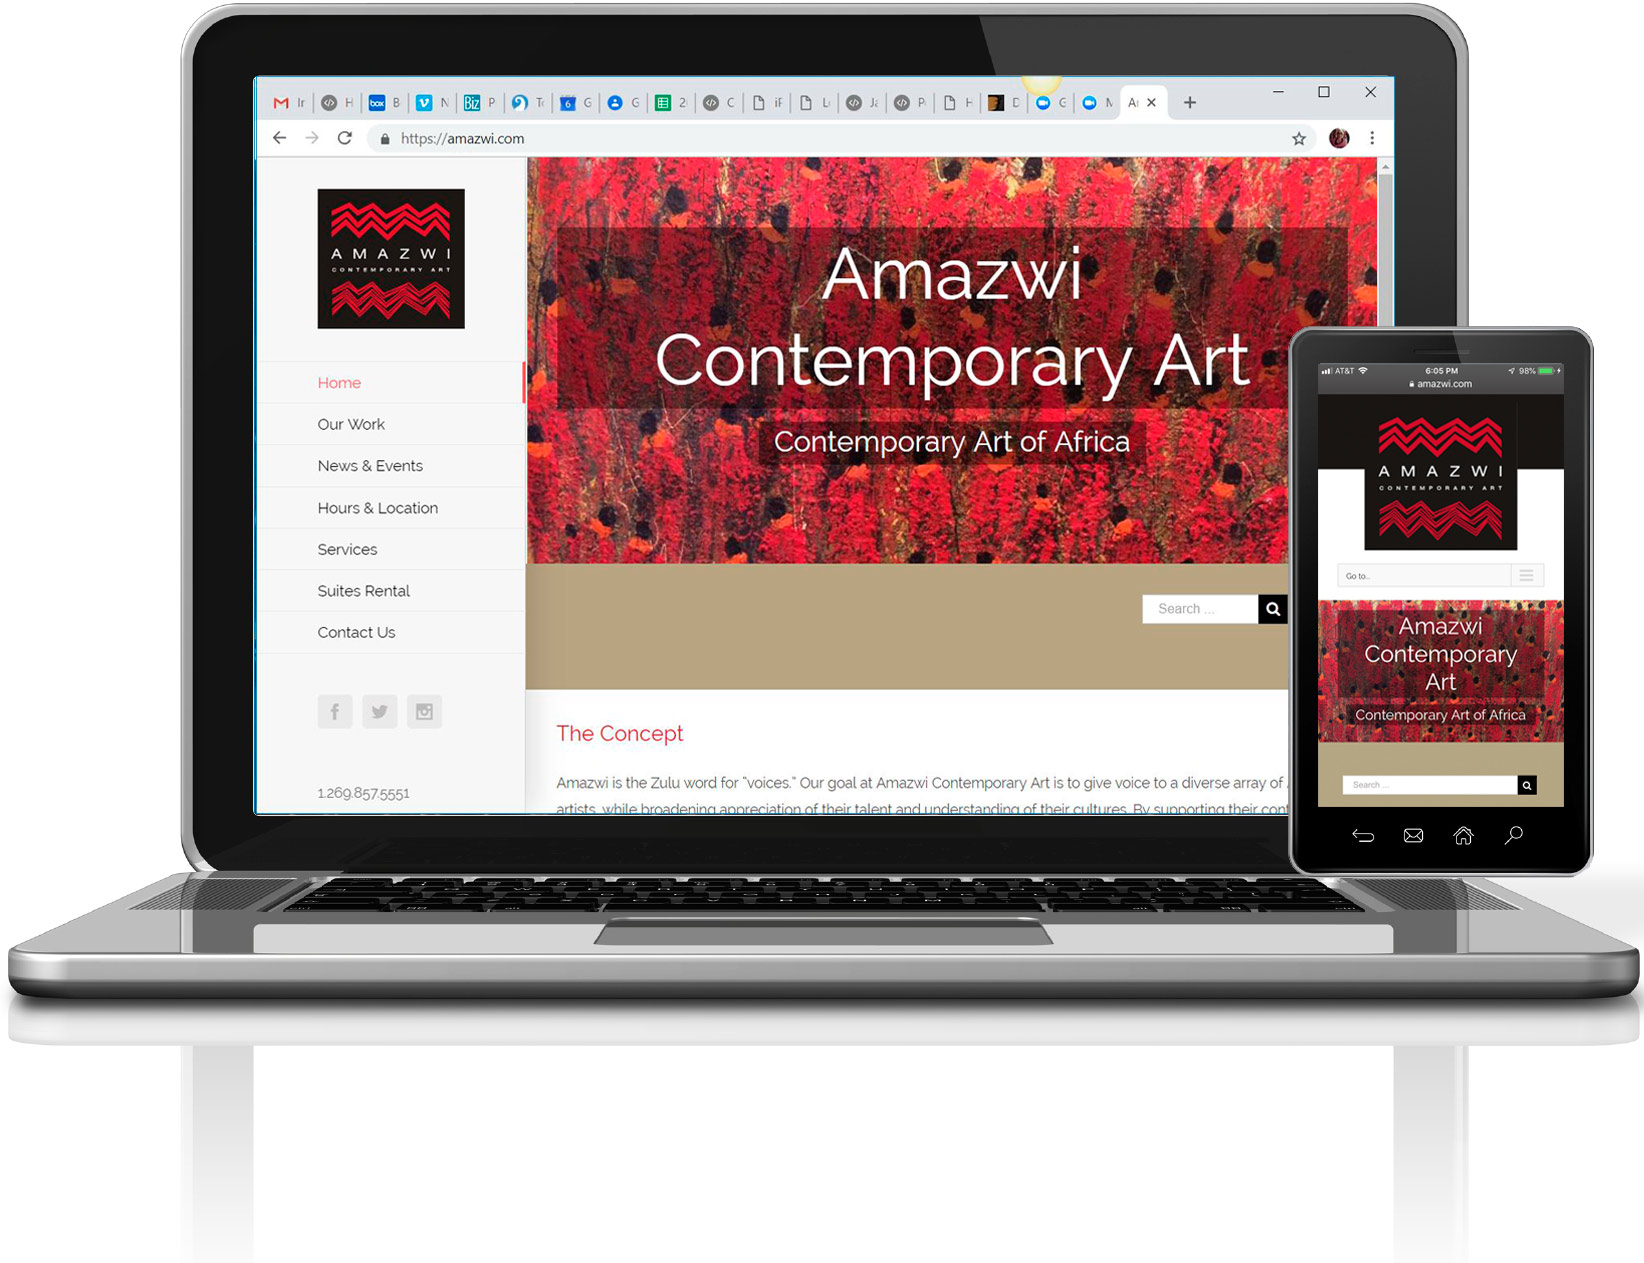 Amazwi Contemporary Art